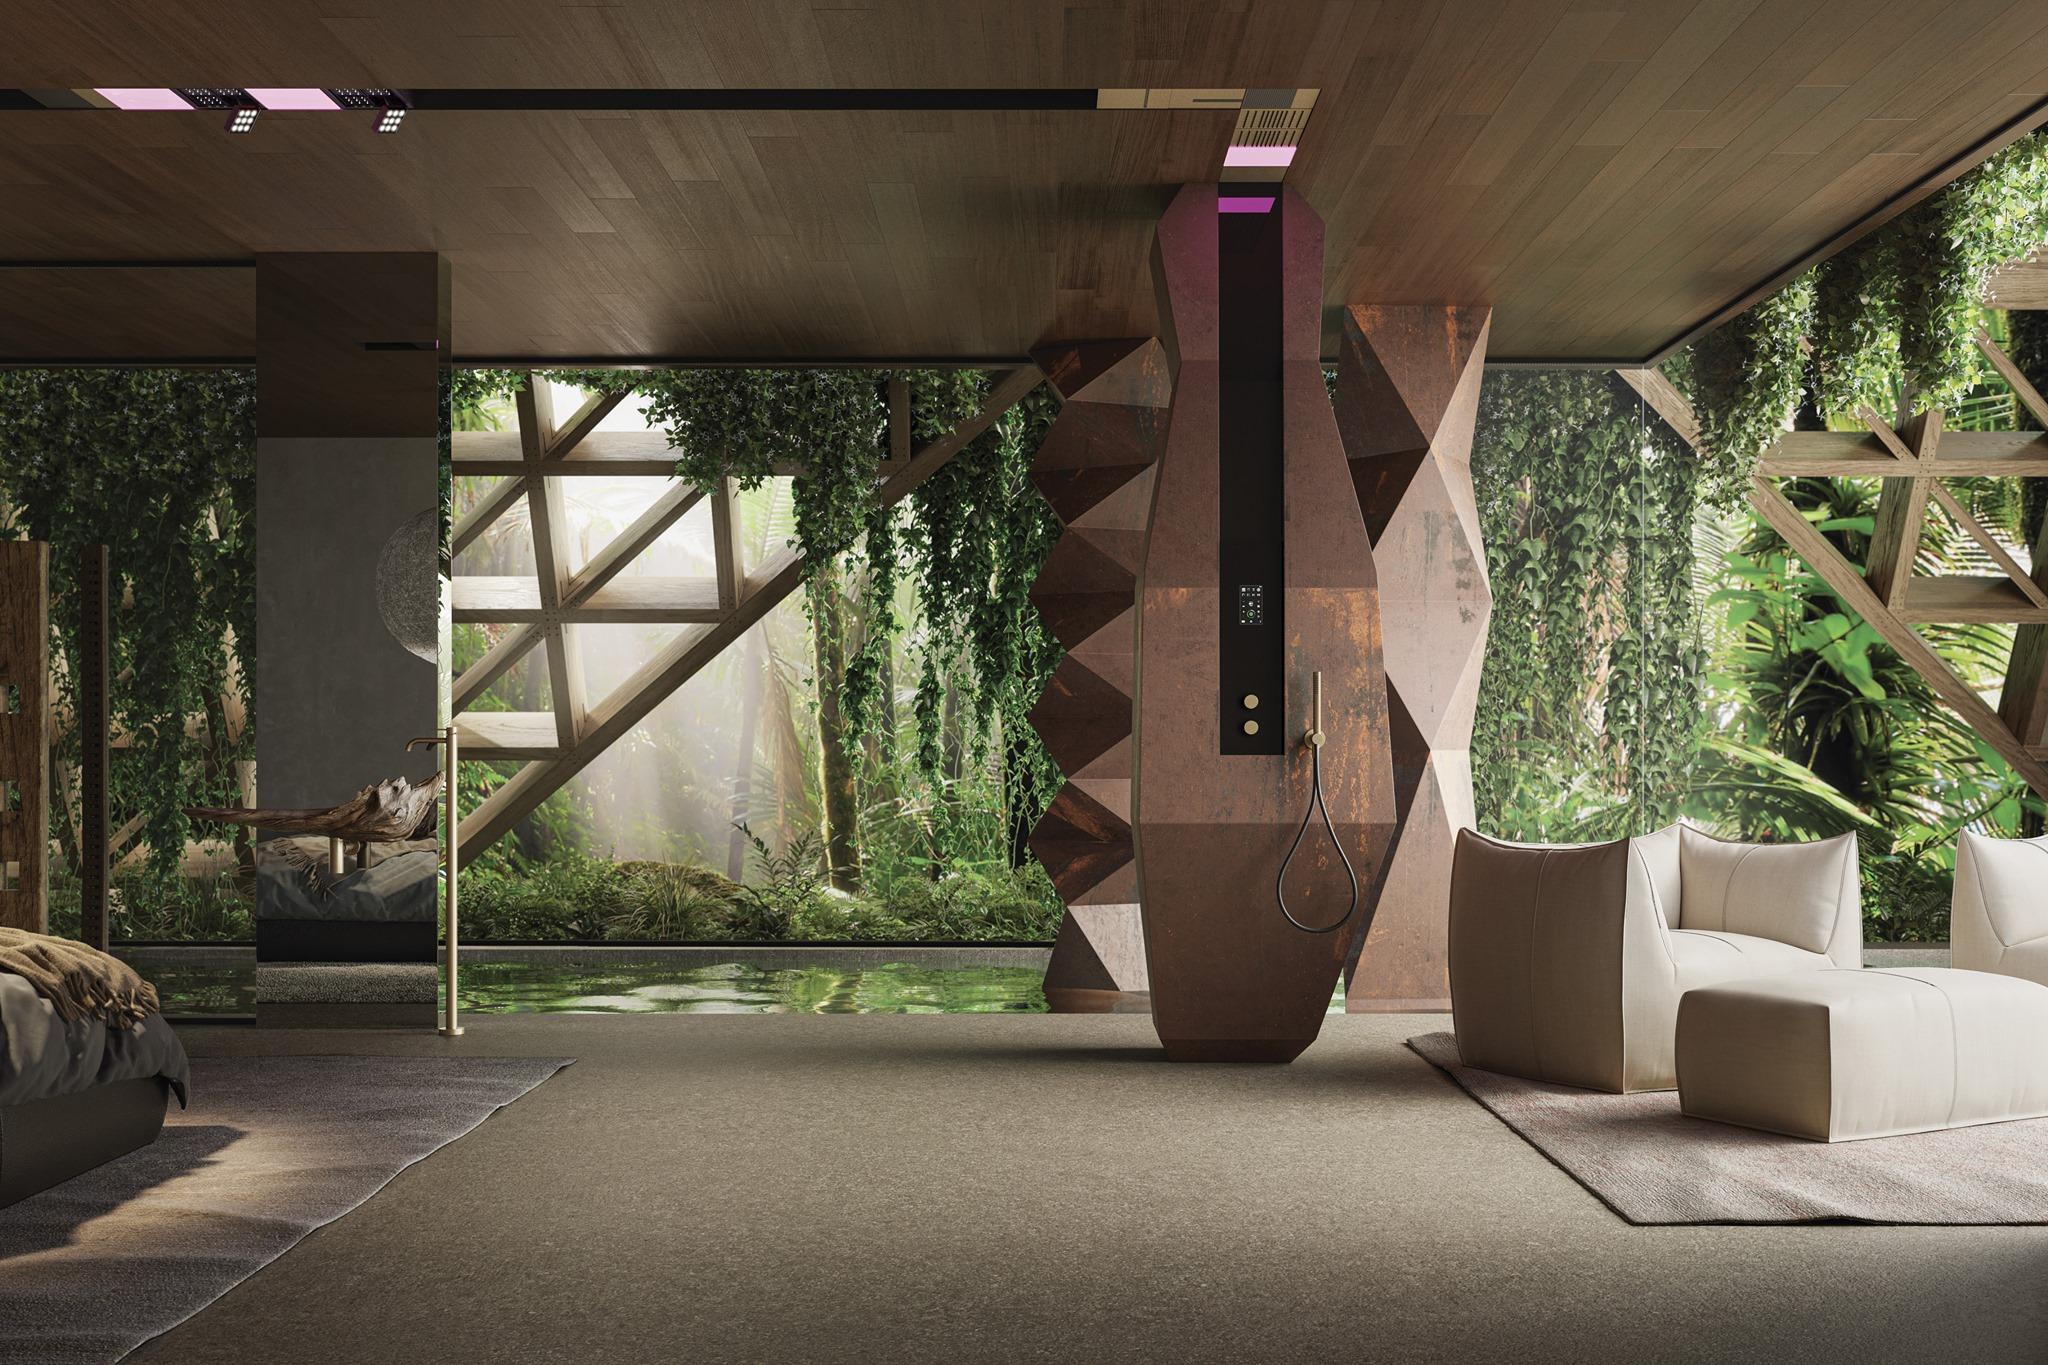 Gessi Architectural Wellness